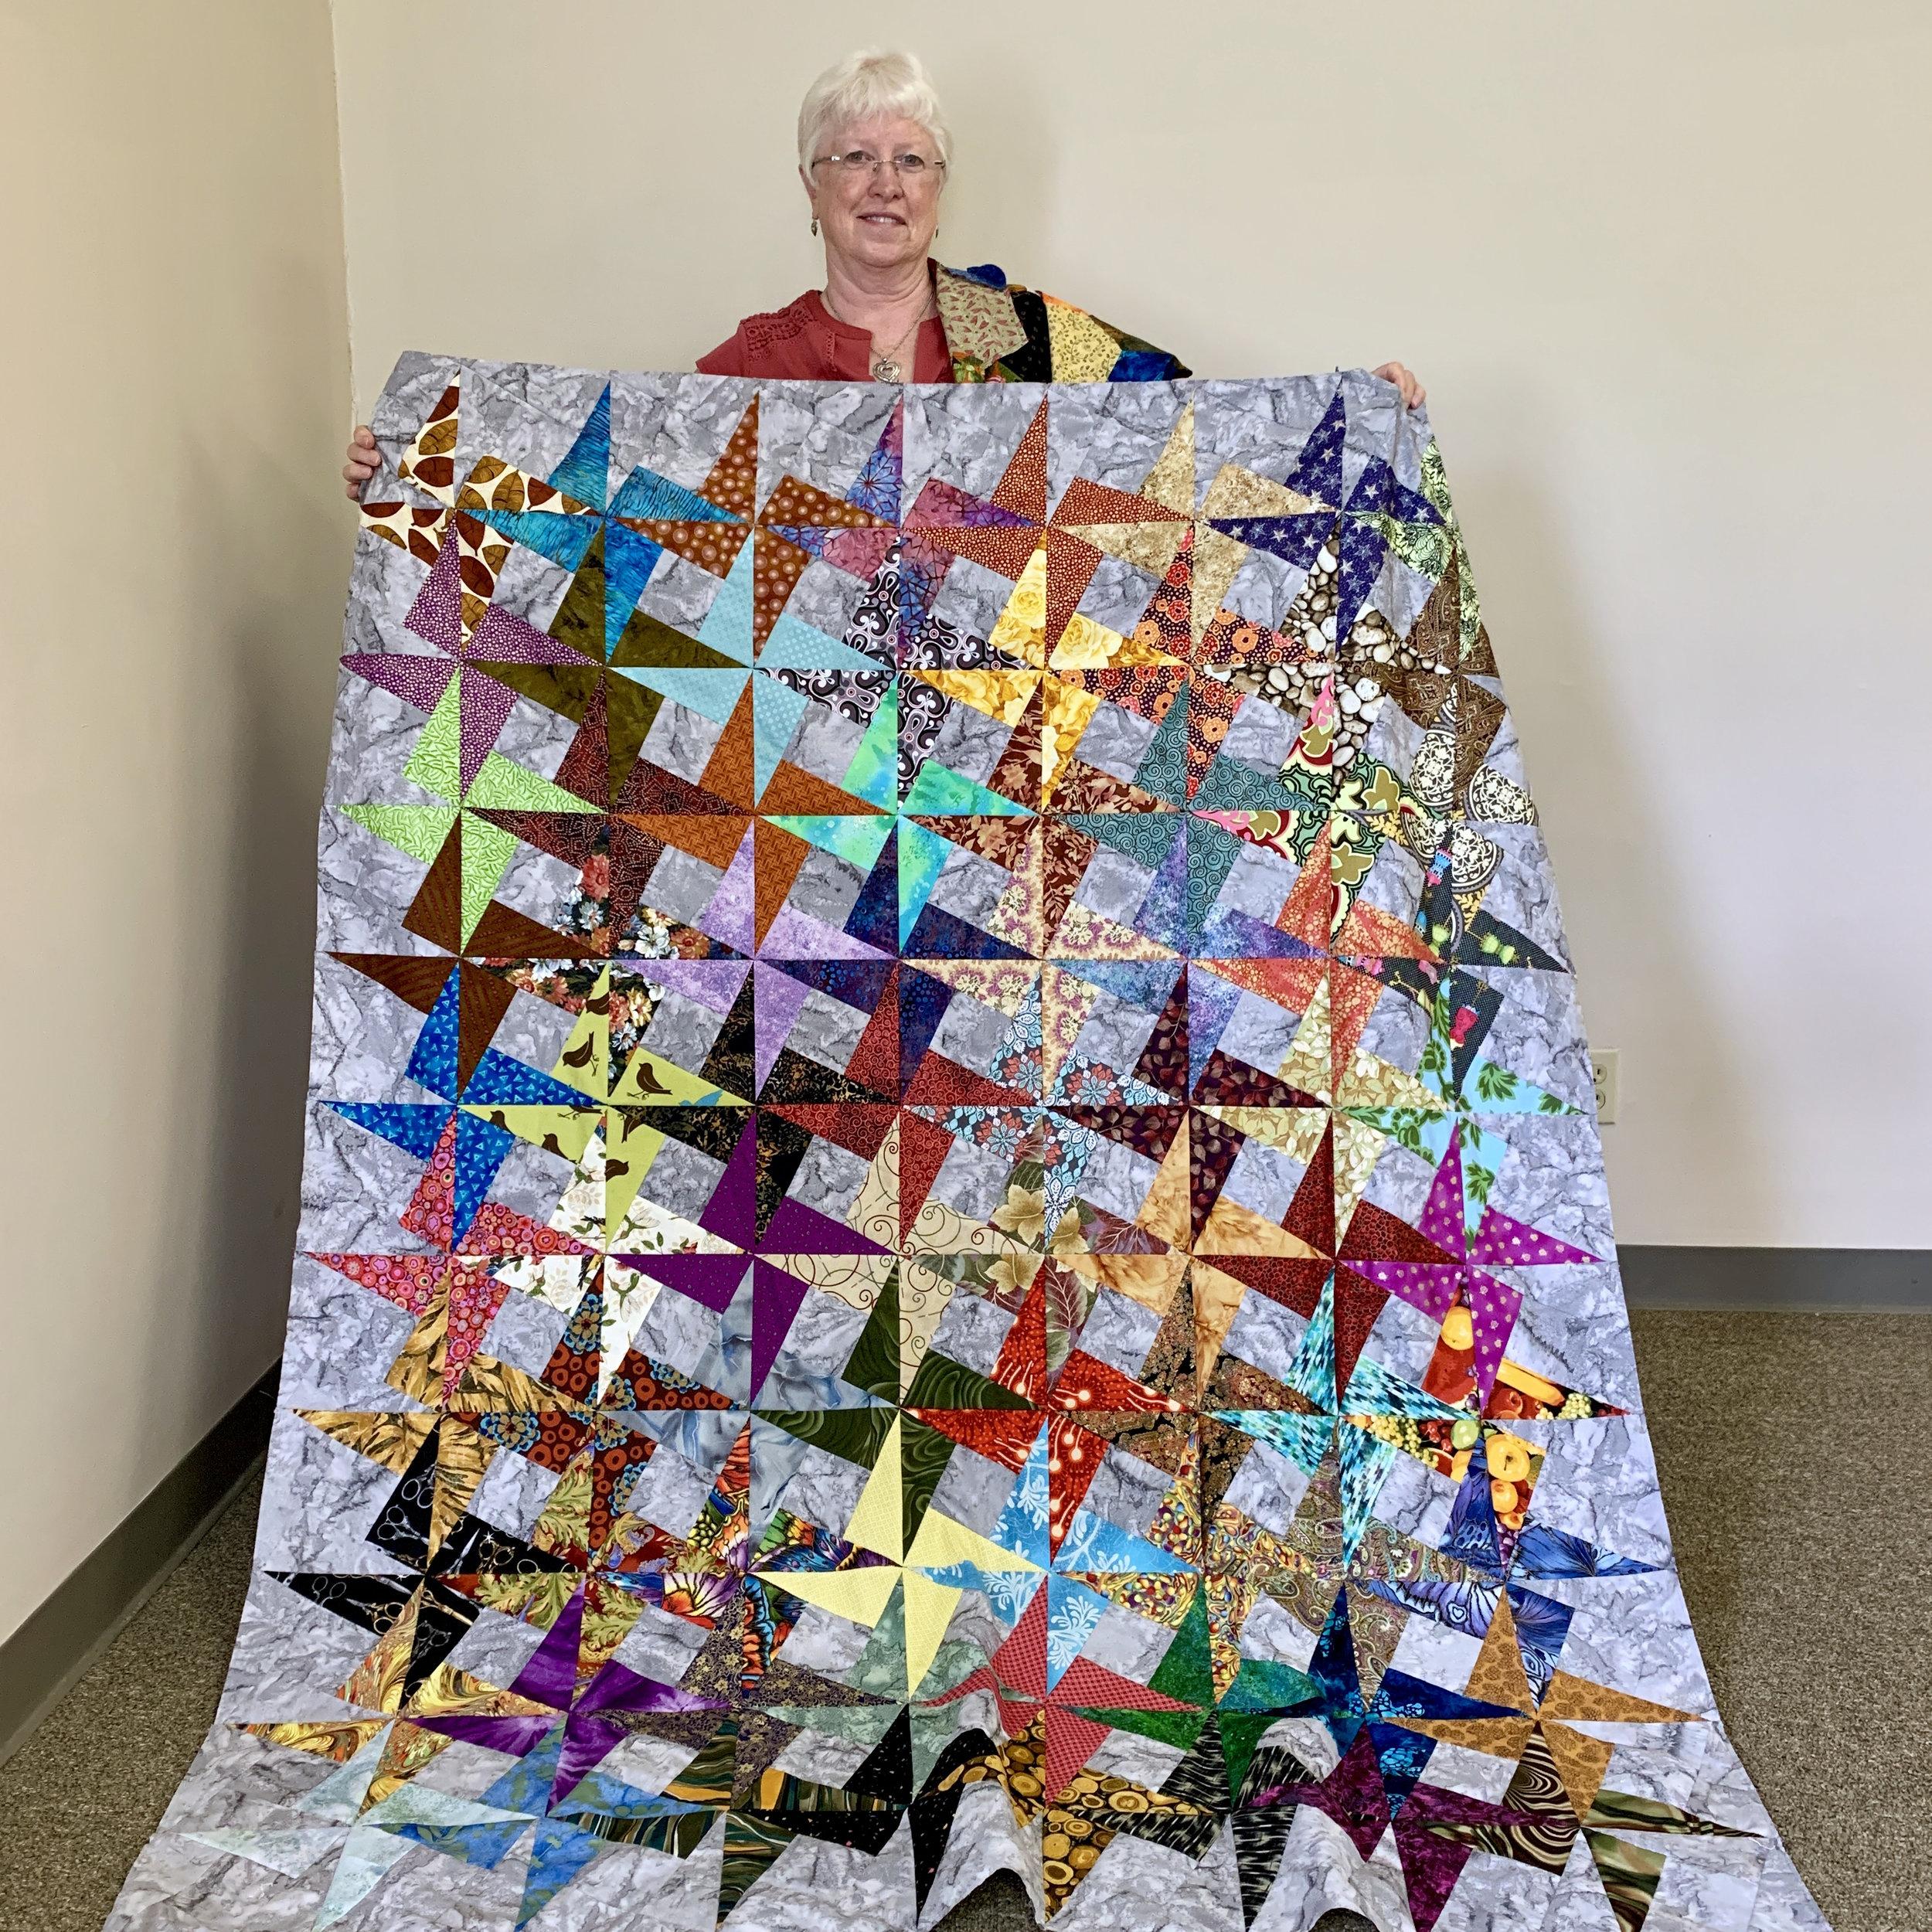 Quilt by Martha Steele